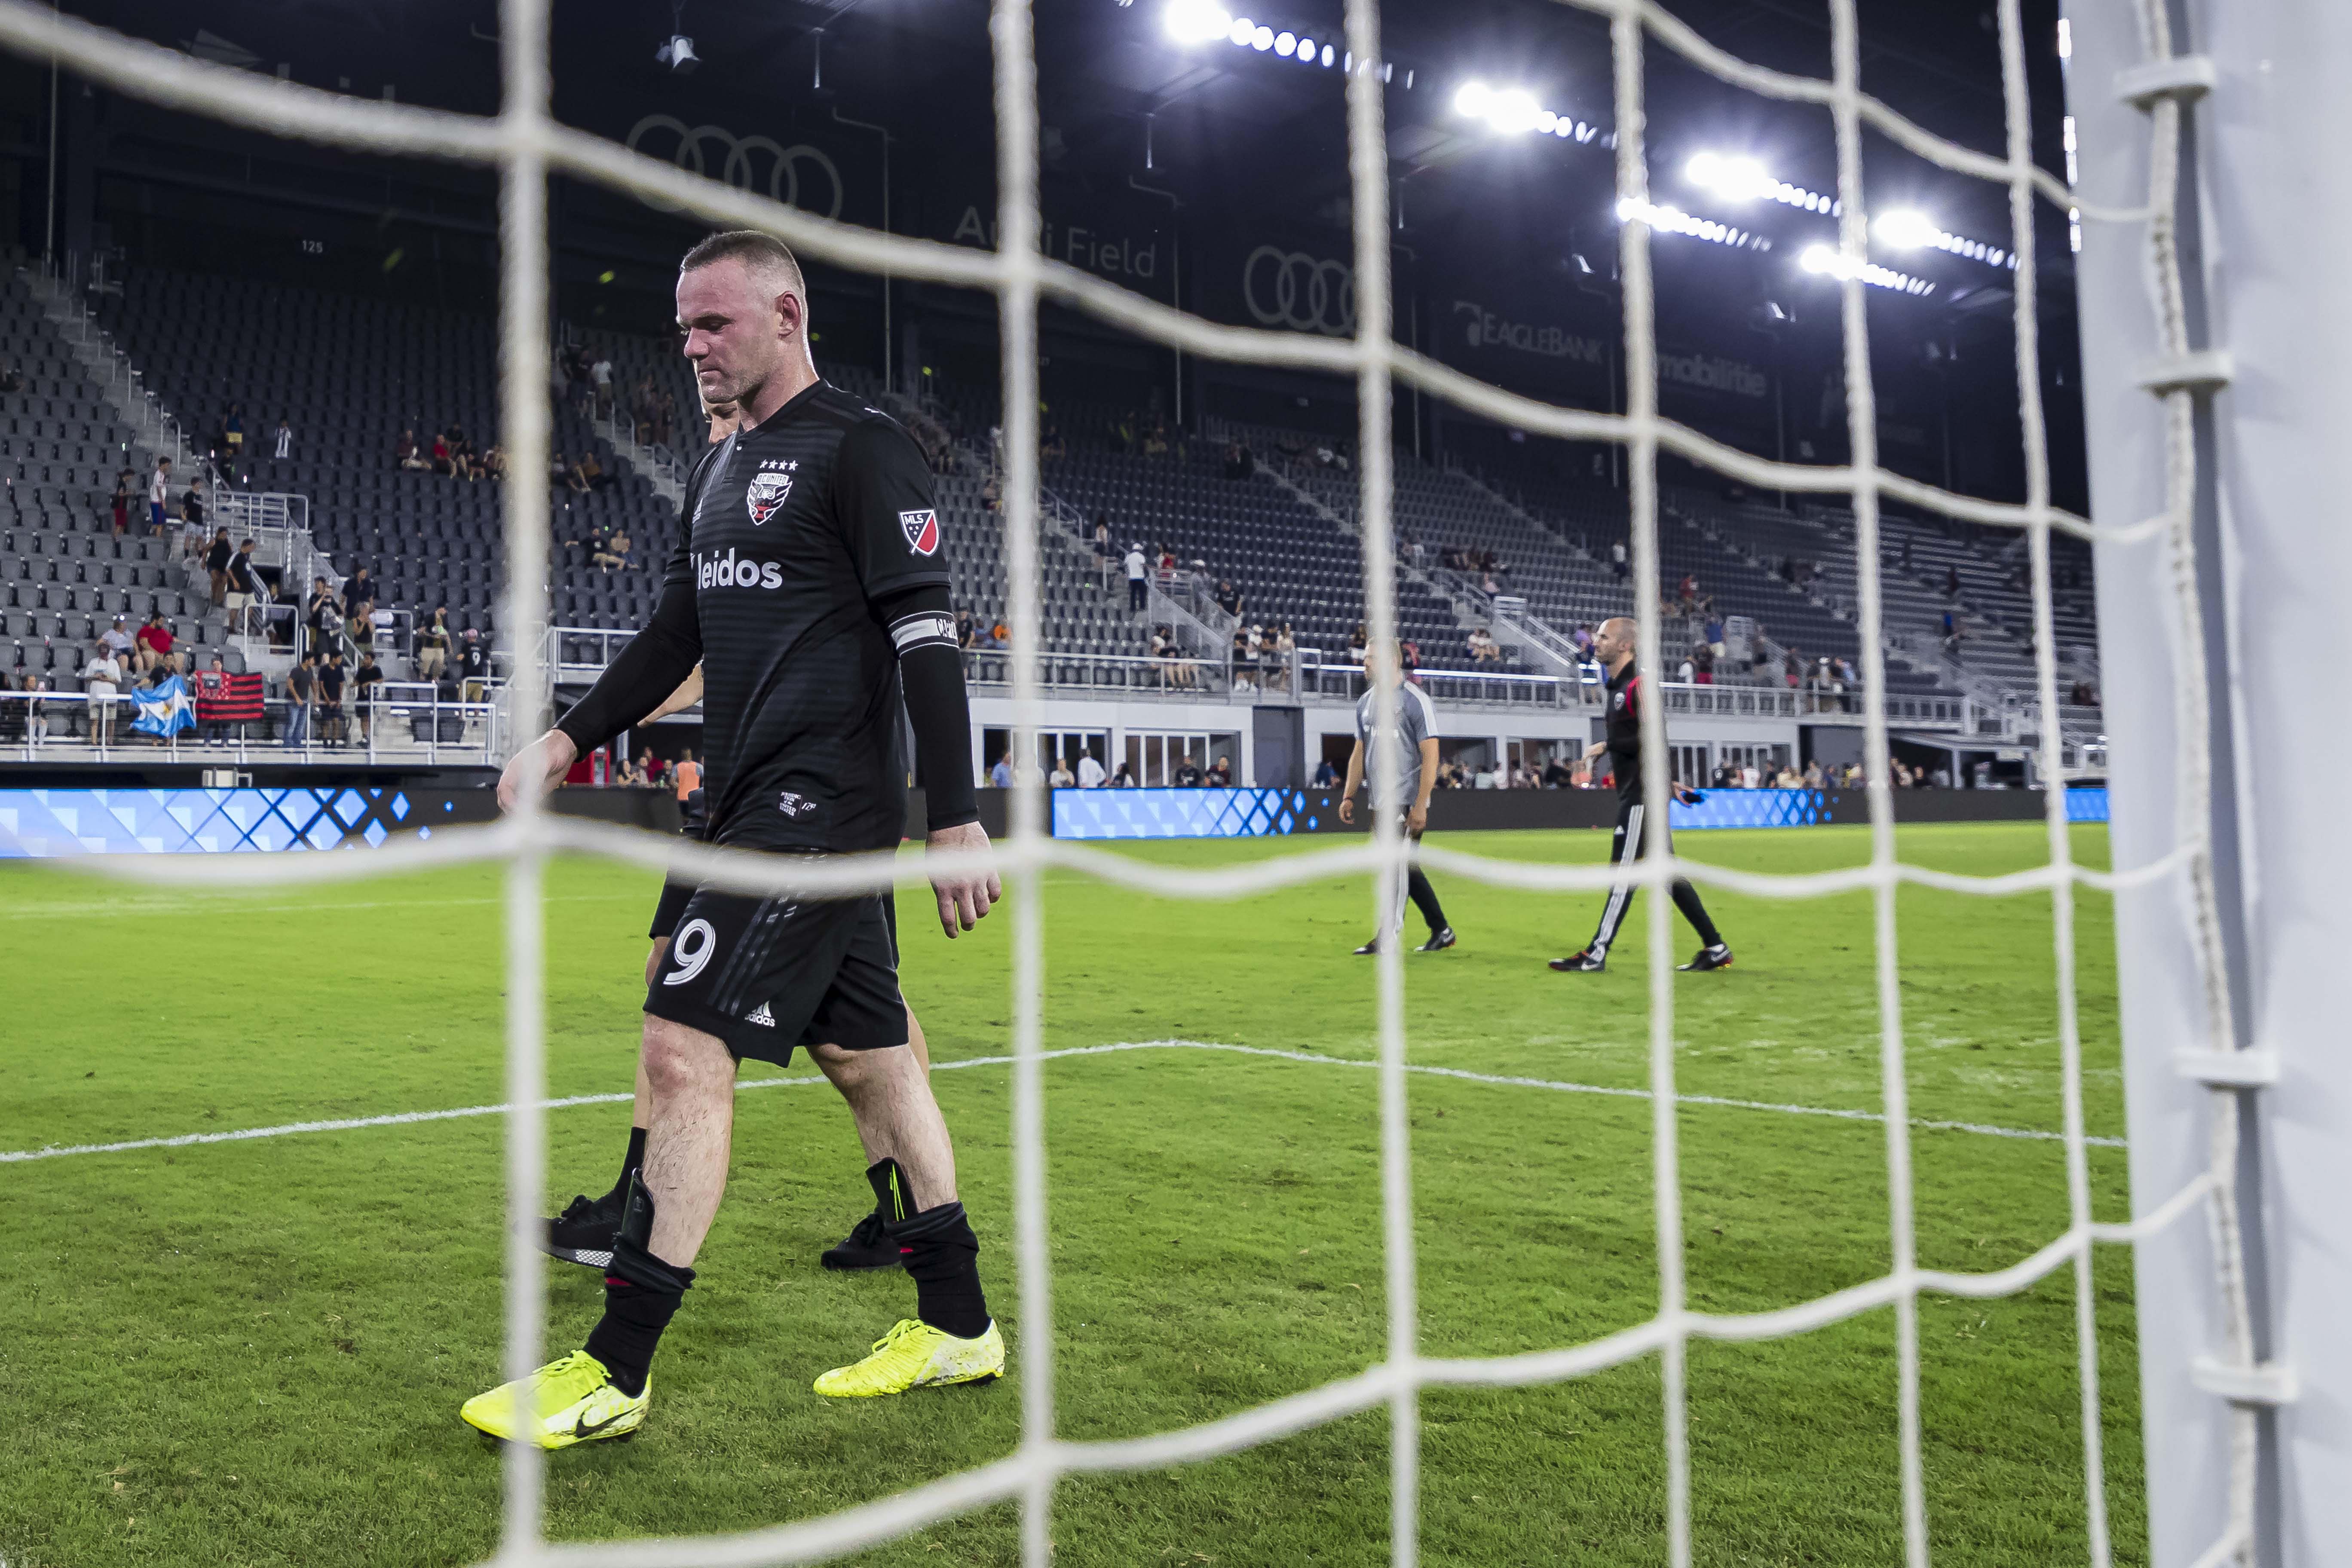 Will Wayne Rooney depart DC United, return to English Premier League?